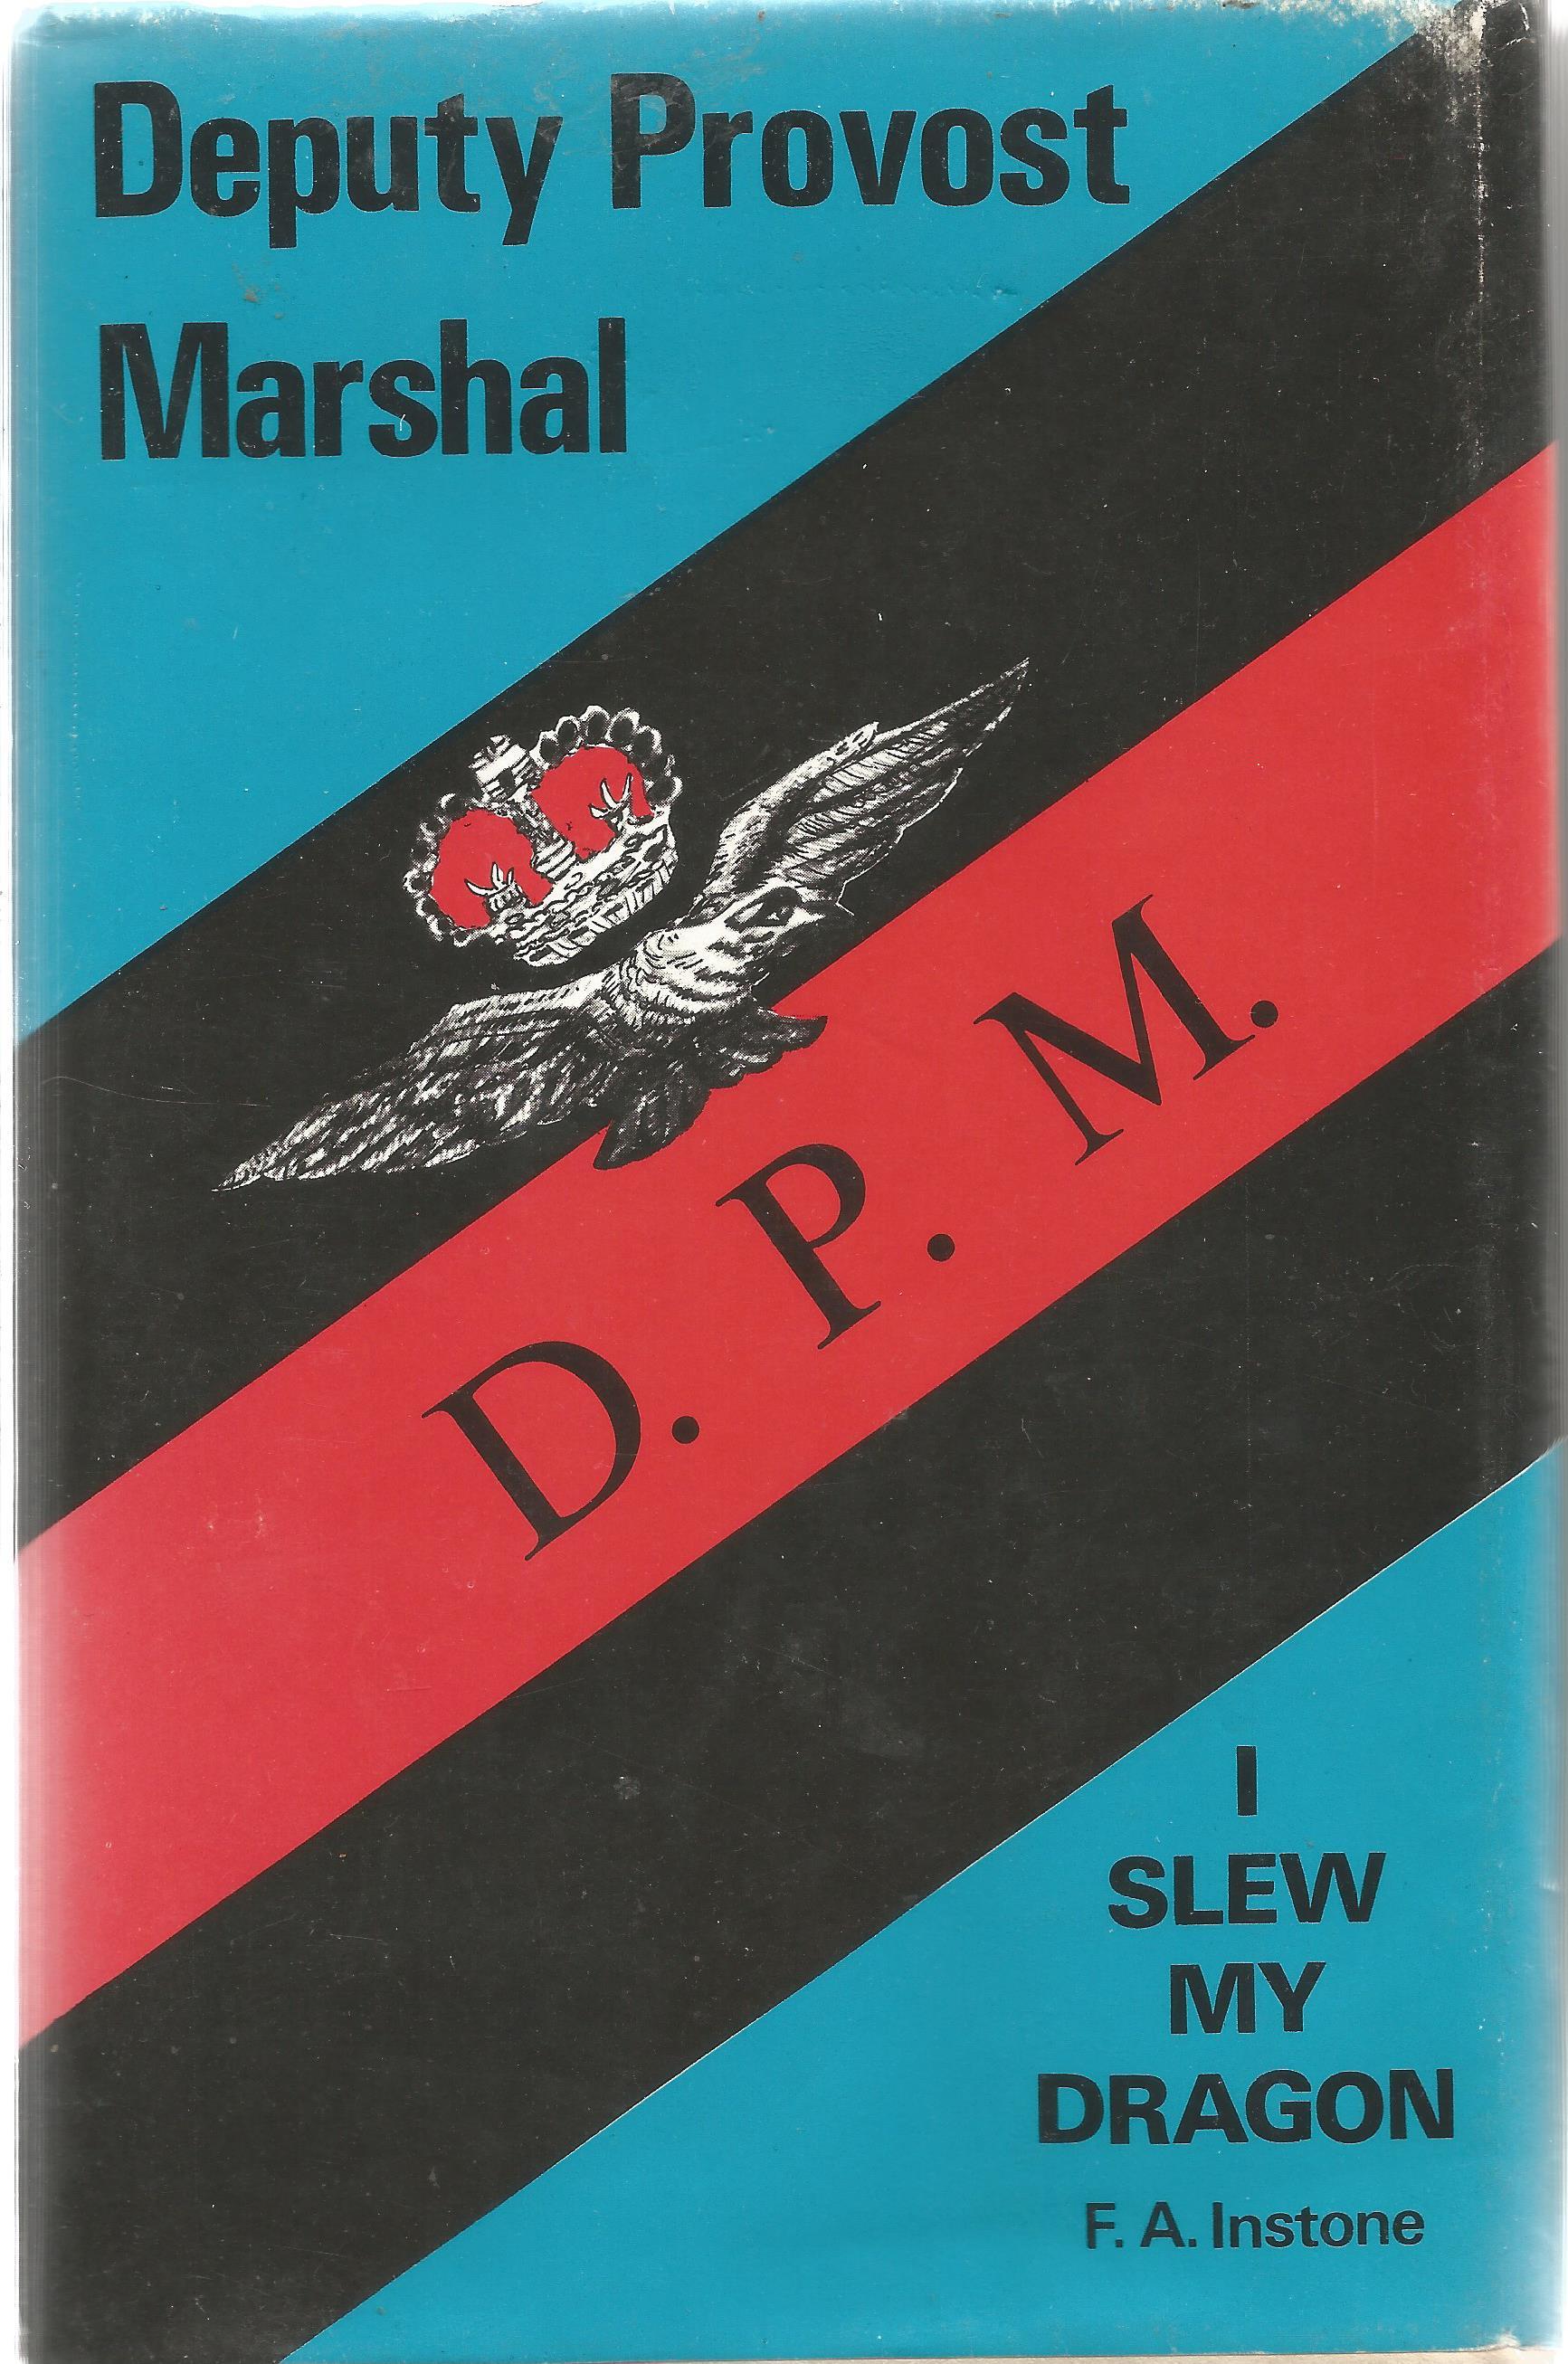 F A Instone. Deputy Provost Marshal D.P.M I Slew My Dragon. A WW2 hardback First edition book. - Image 3 of 3